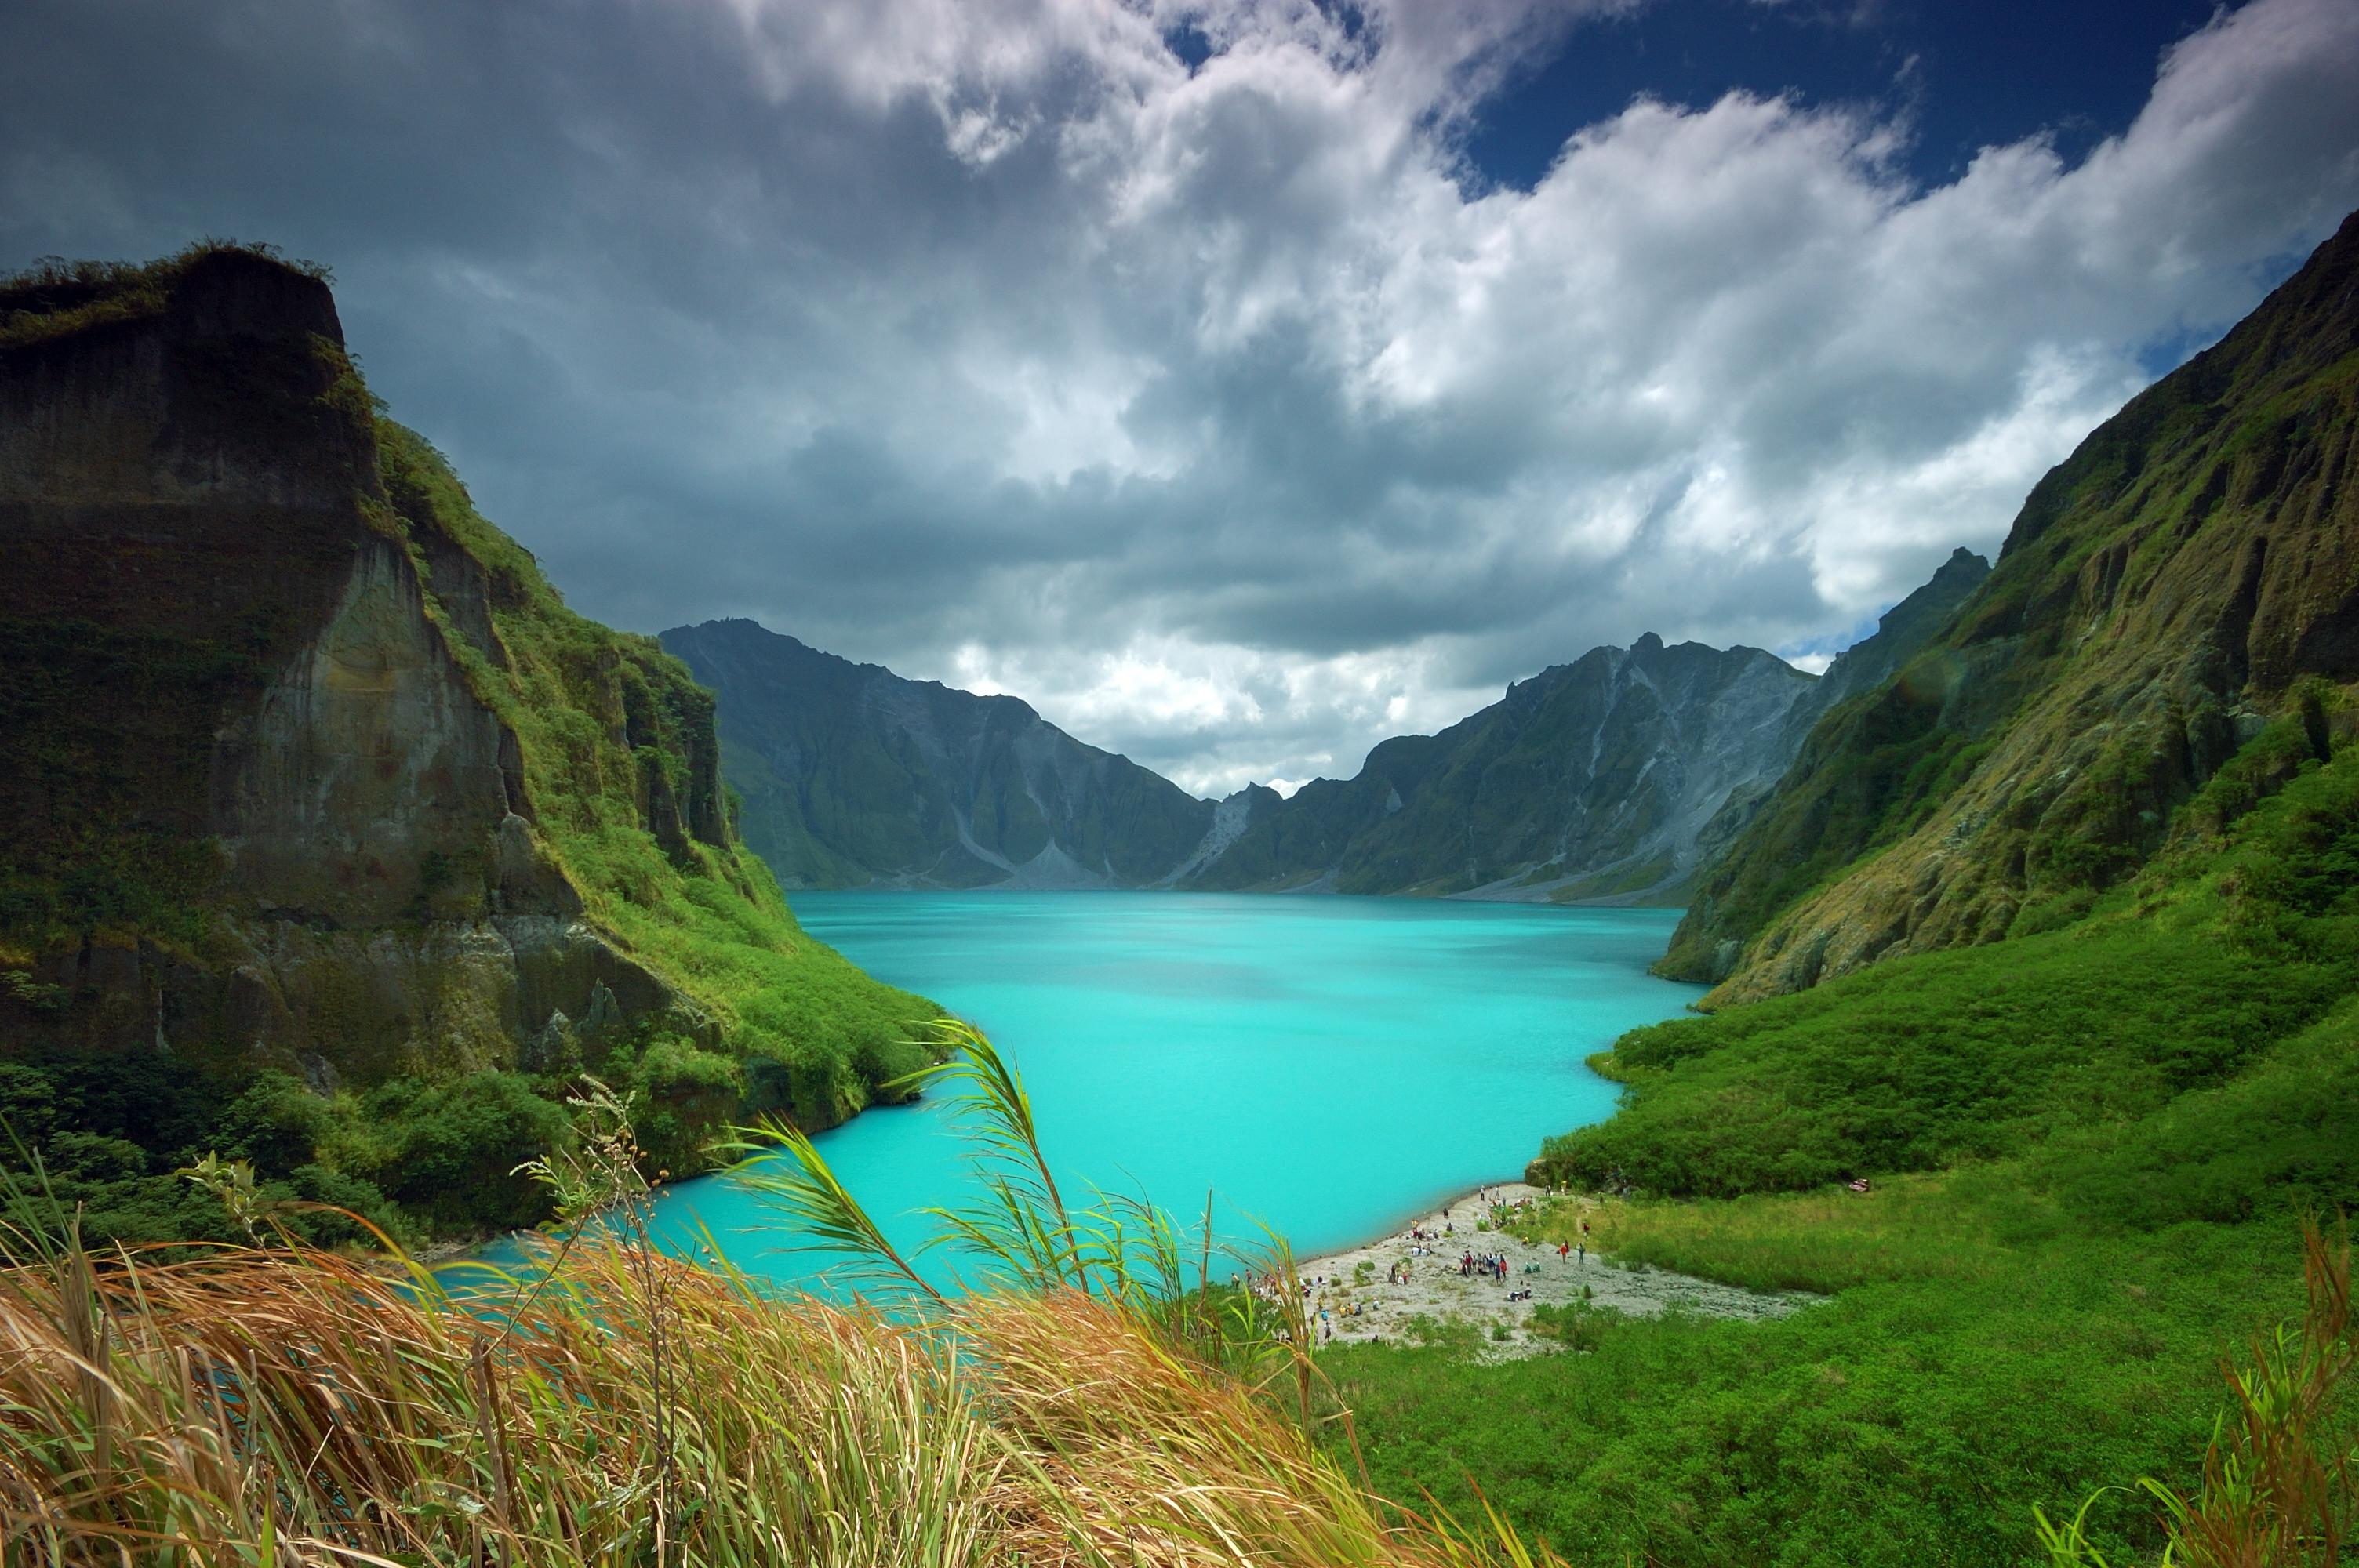 Beautiful view of Mount Pinatubo Crater Lake